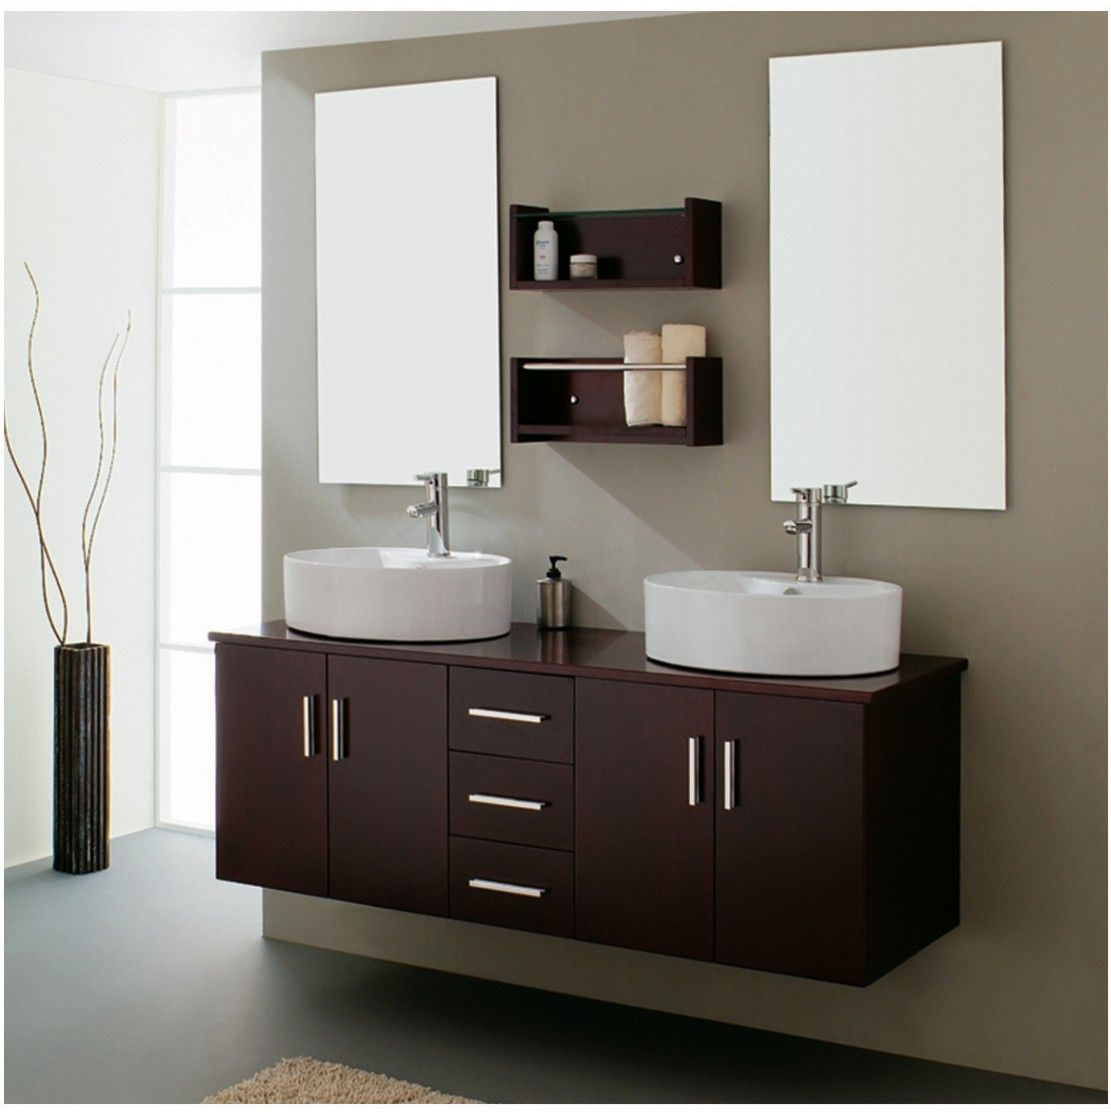 Best Amazing Modern Bathroom Design Ideas To Increase Home 400 x 300